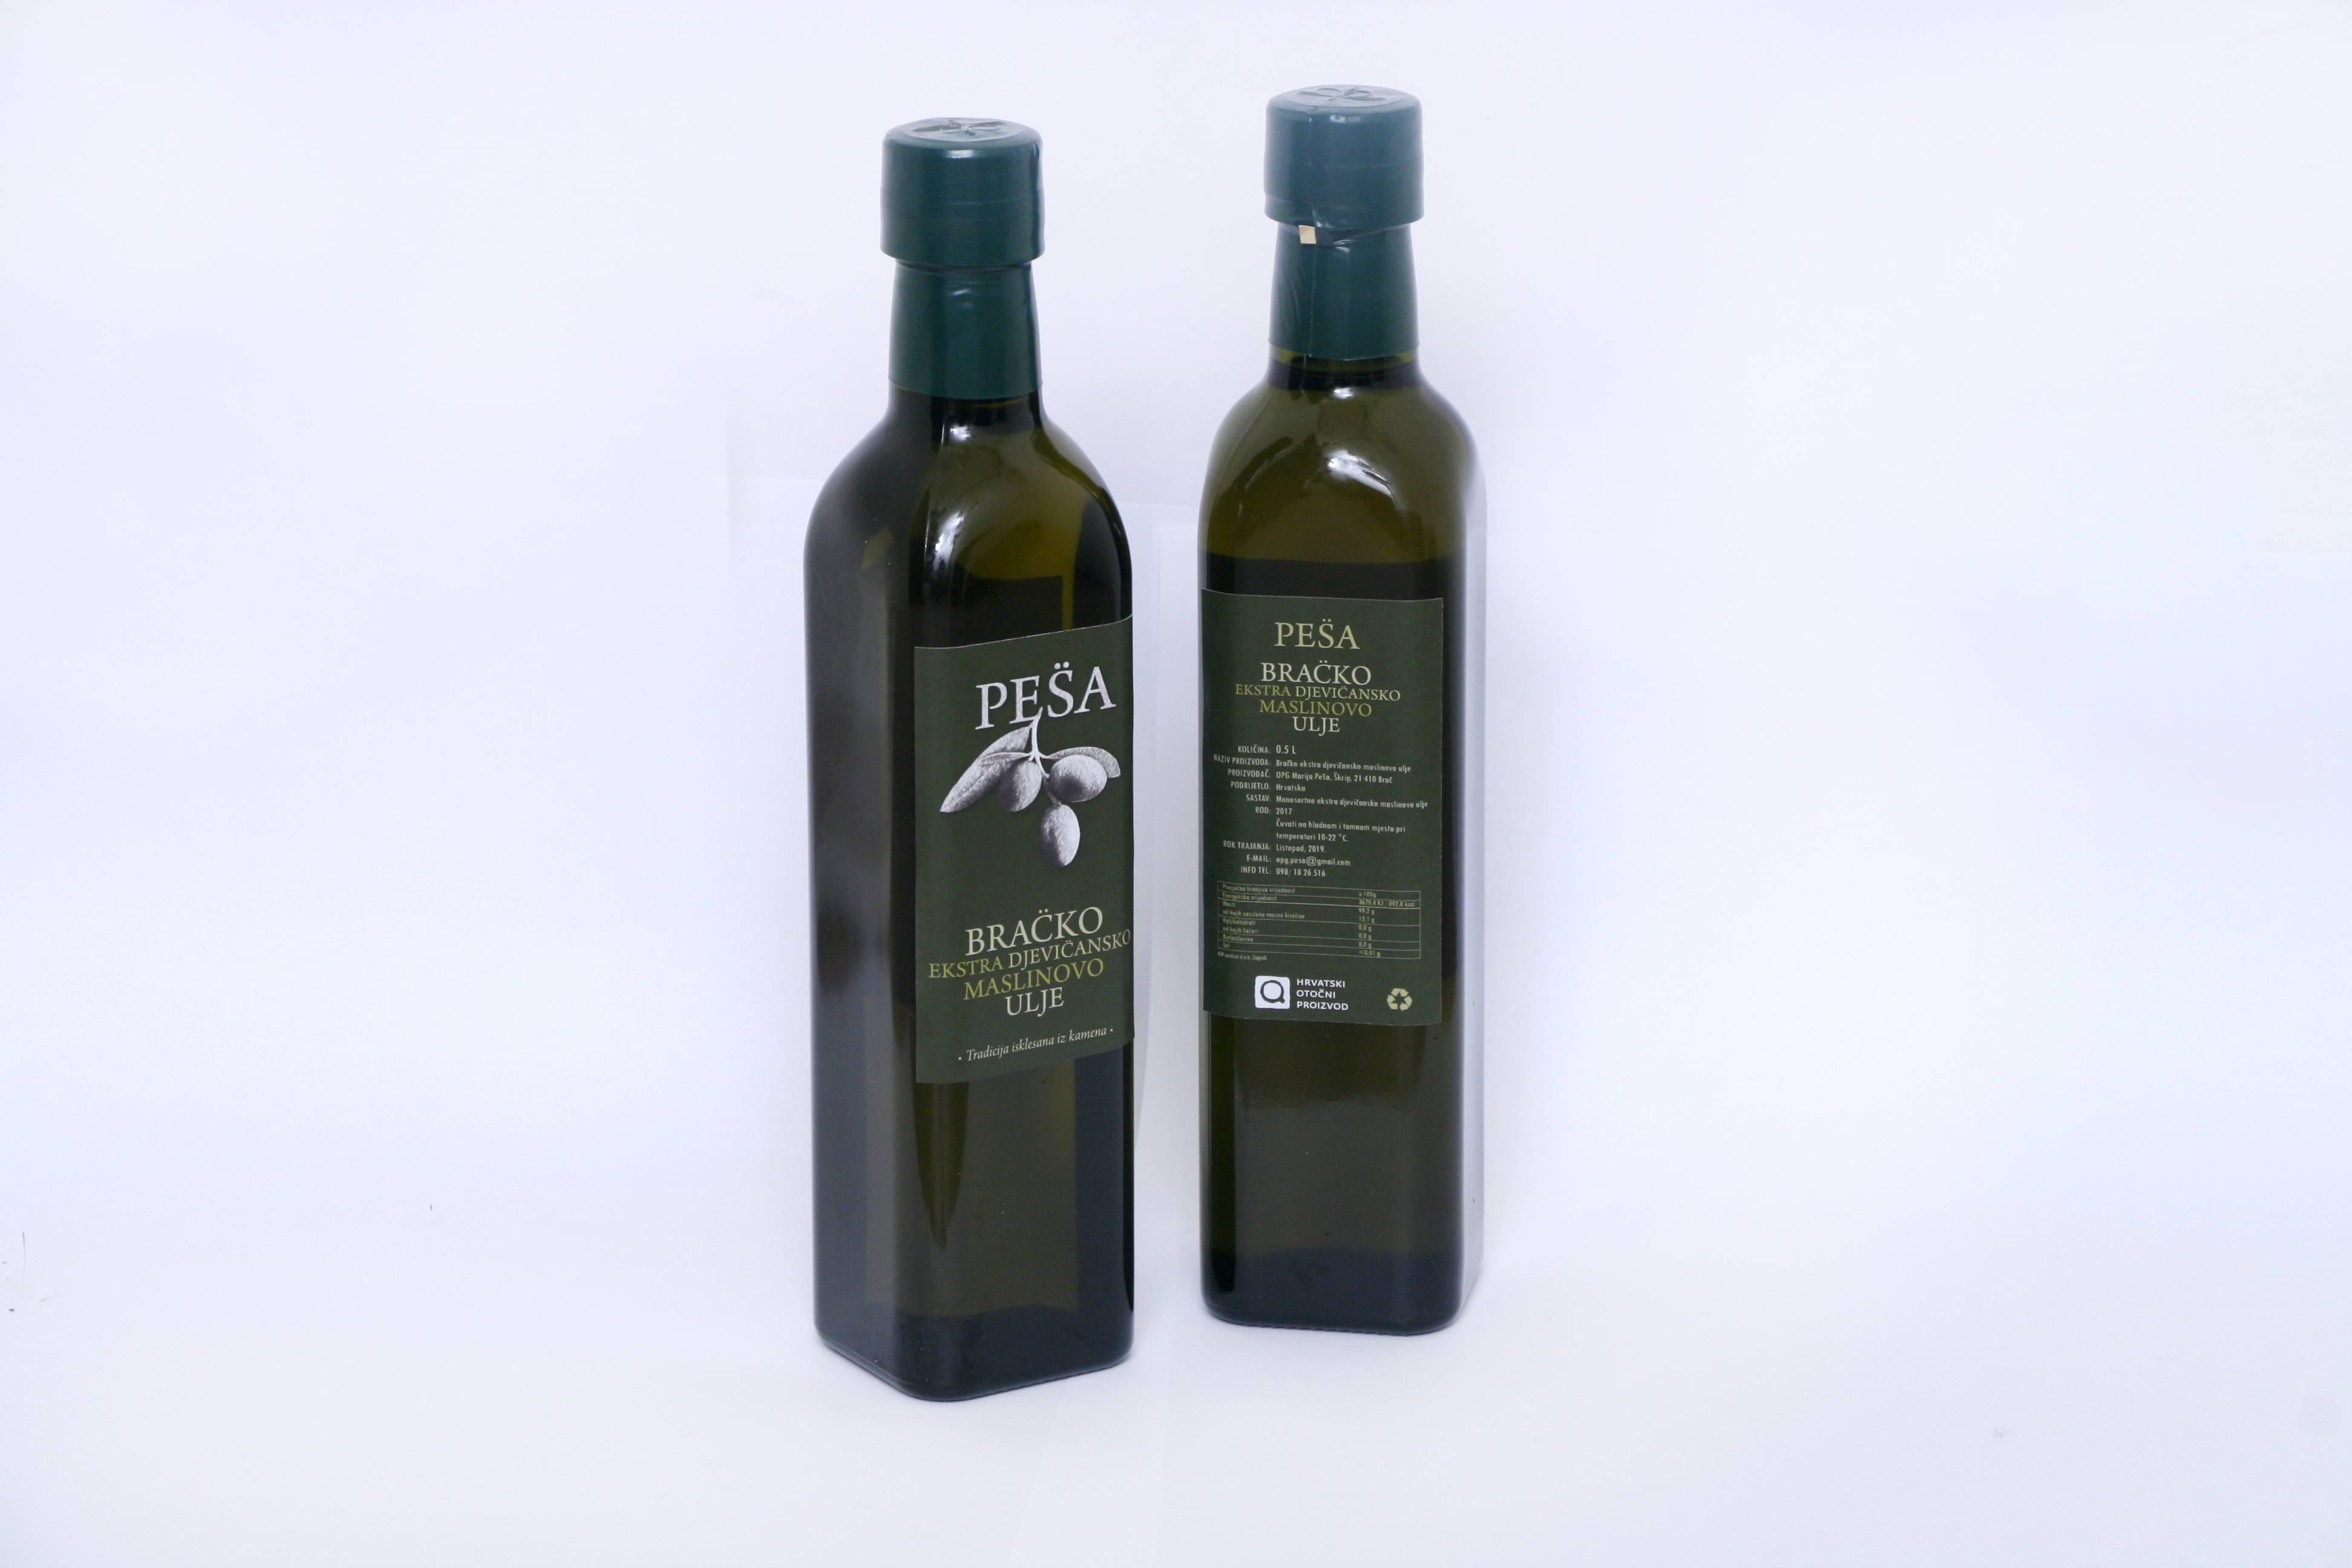 Bračko ekstra djevičansko maslinovo ulje 0.5 l